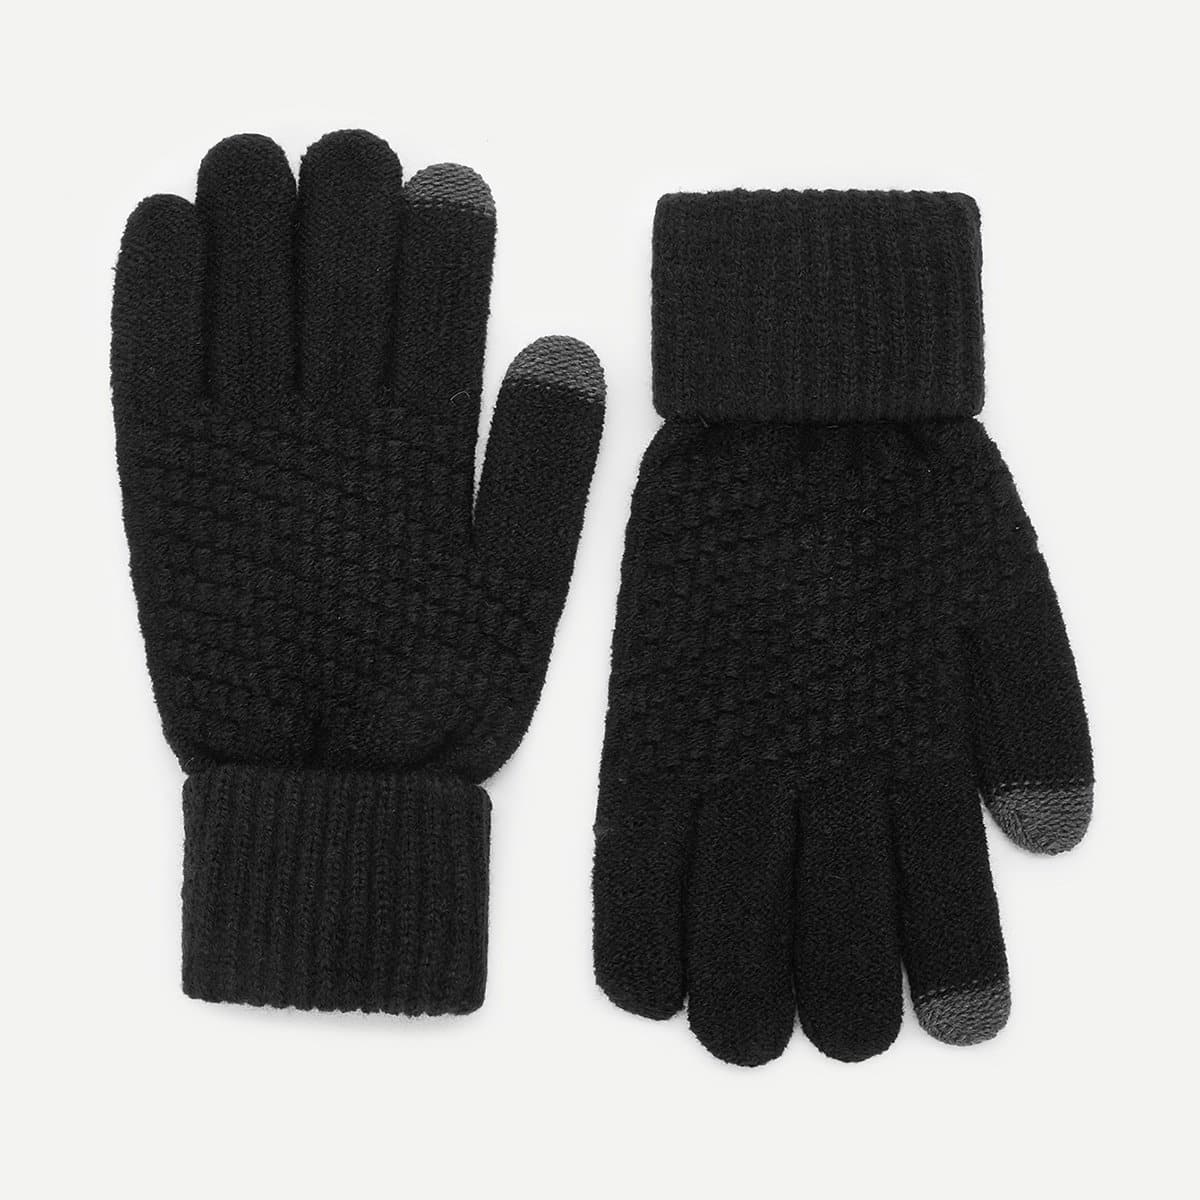 Einfache Handschuhe